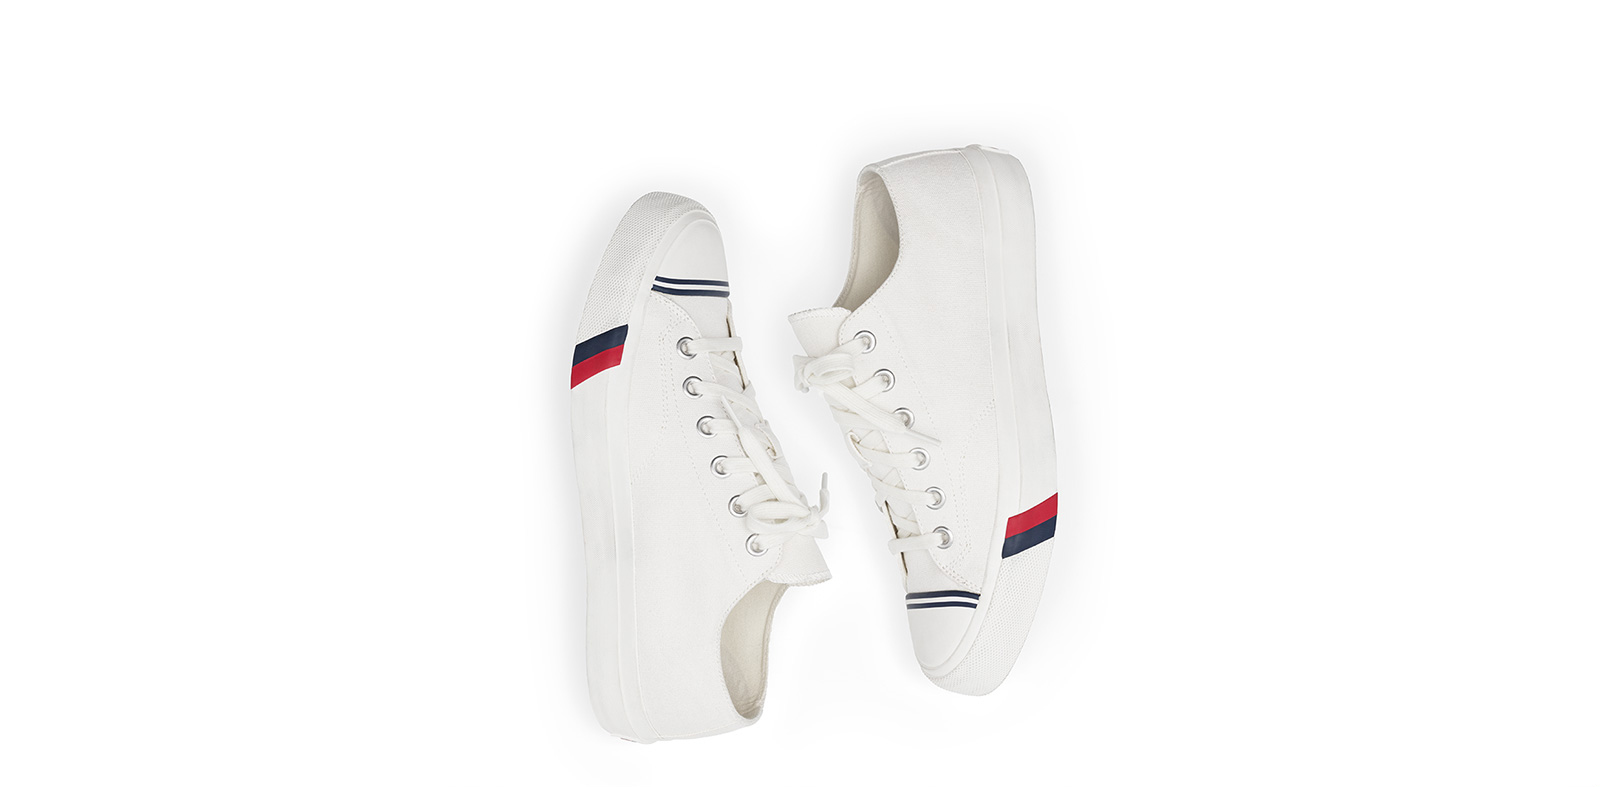 PROkeds shoe